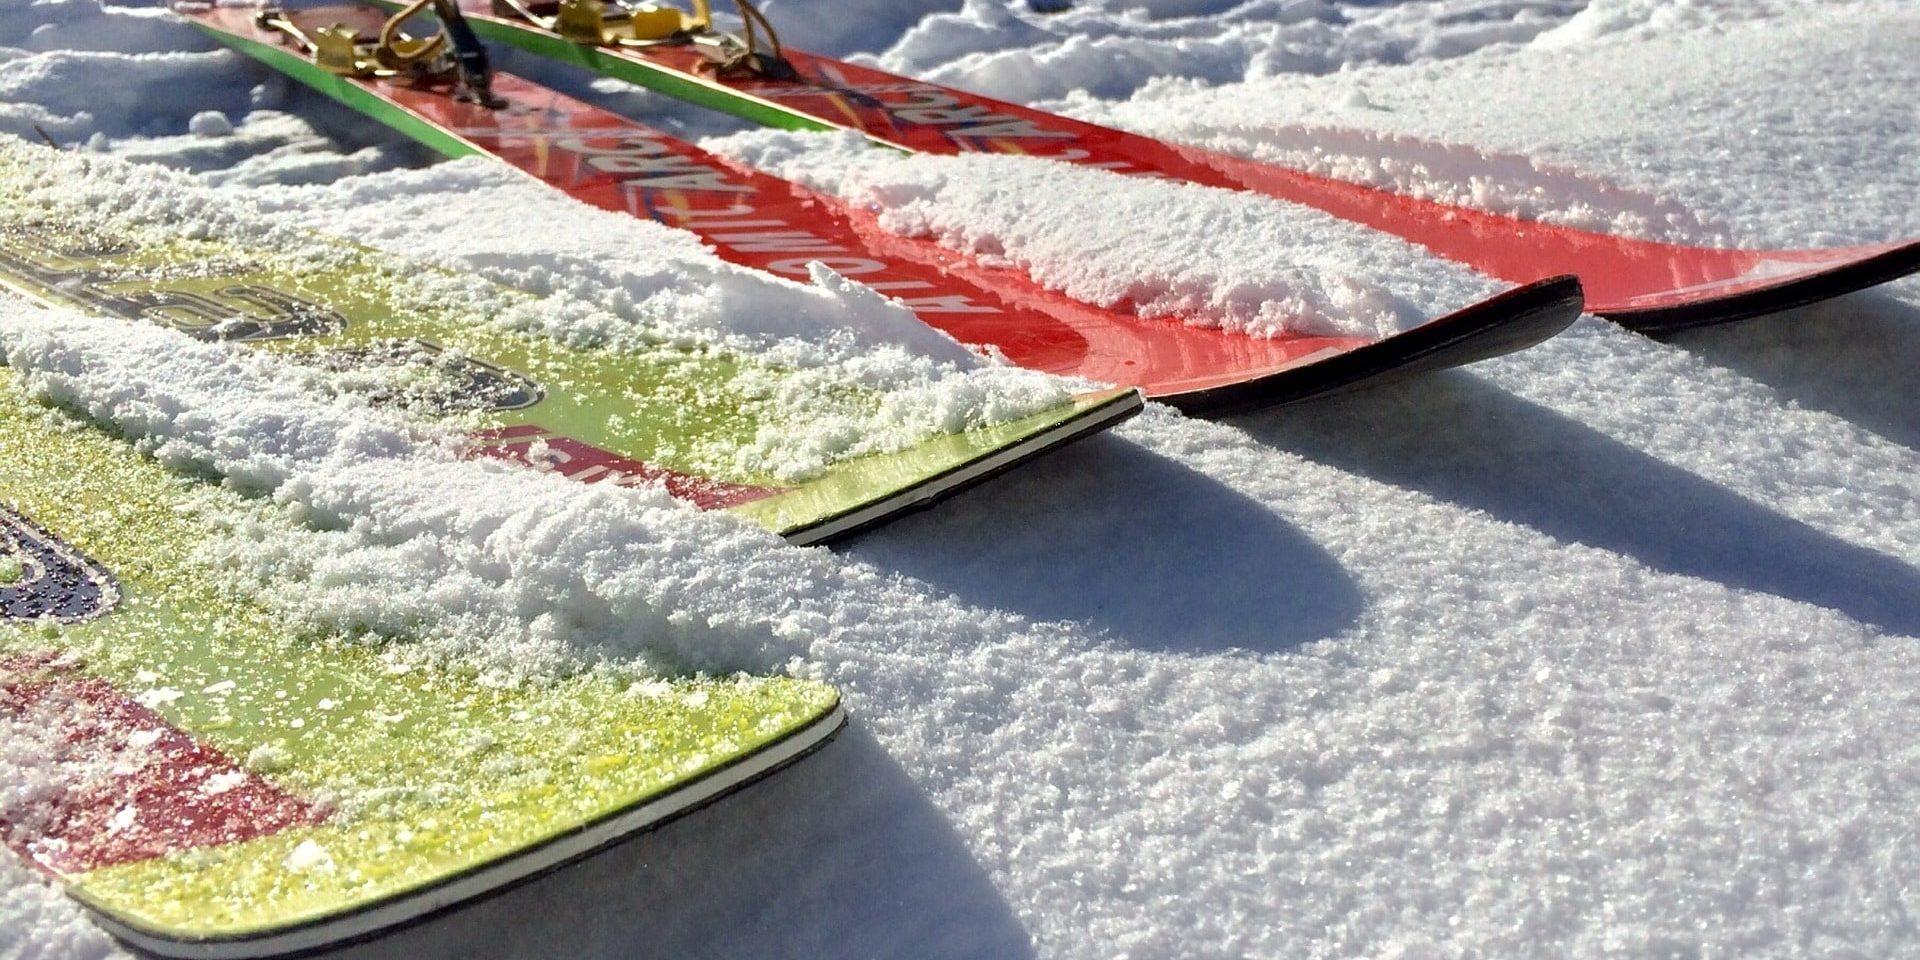 Skis in de sneeuw